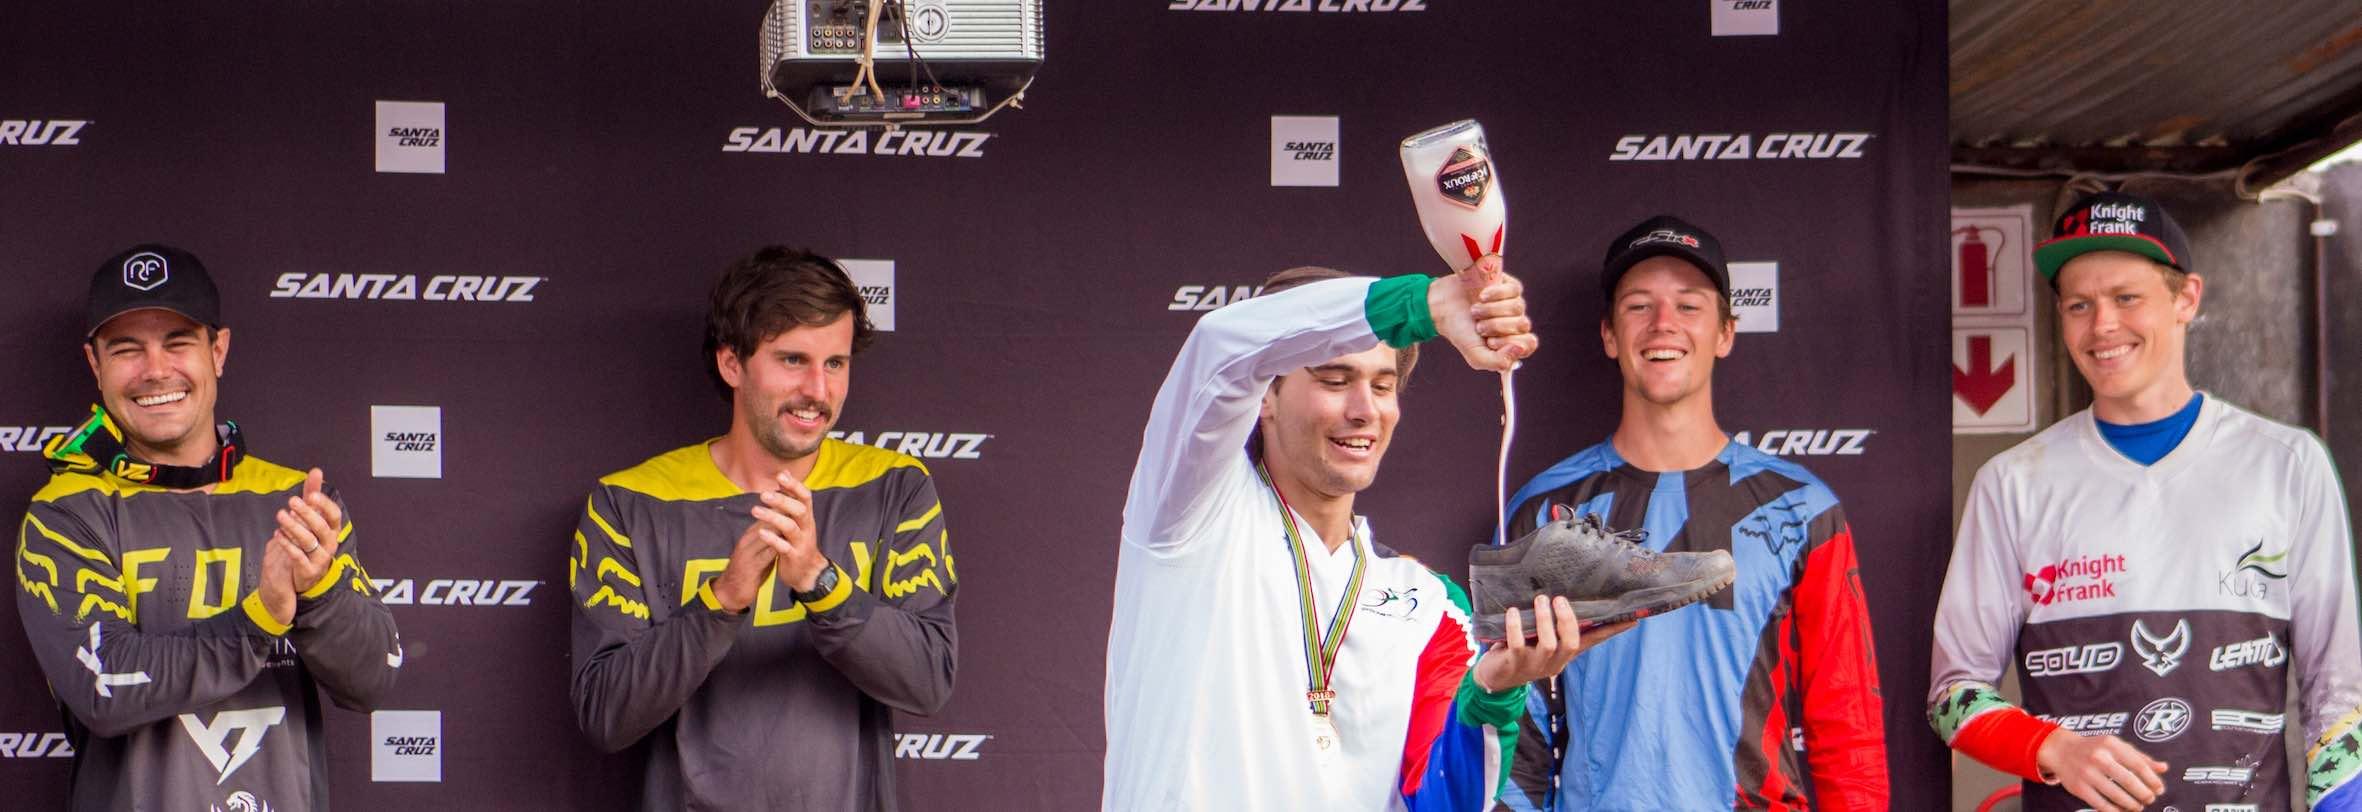 Theo Erlangsen celebrating his 2018 SA Downhill MTB Championships win